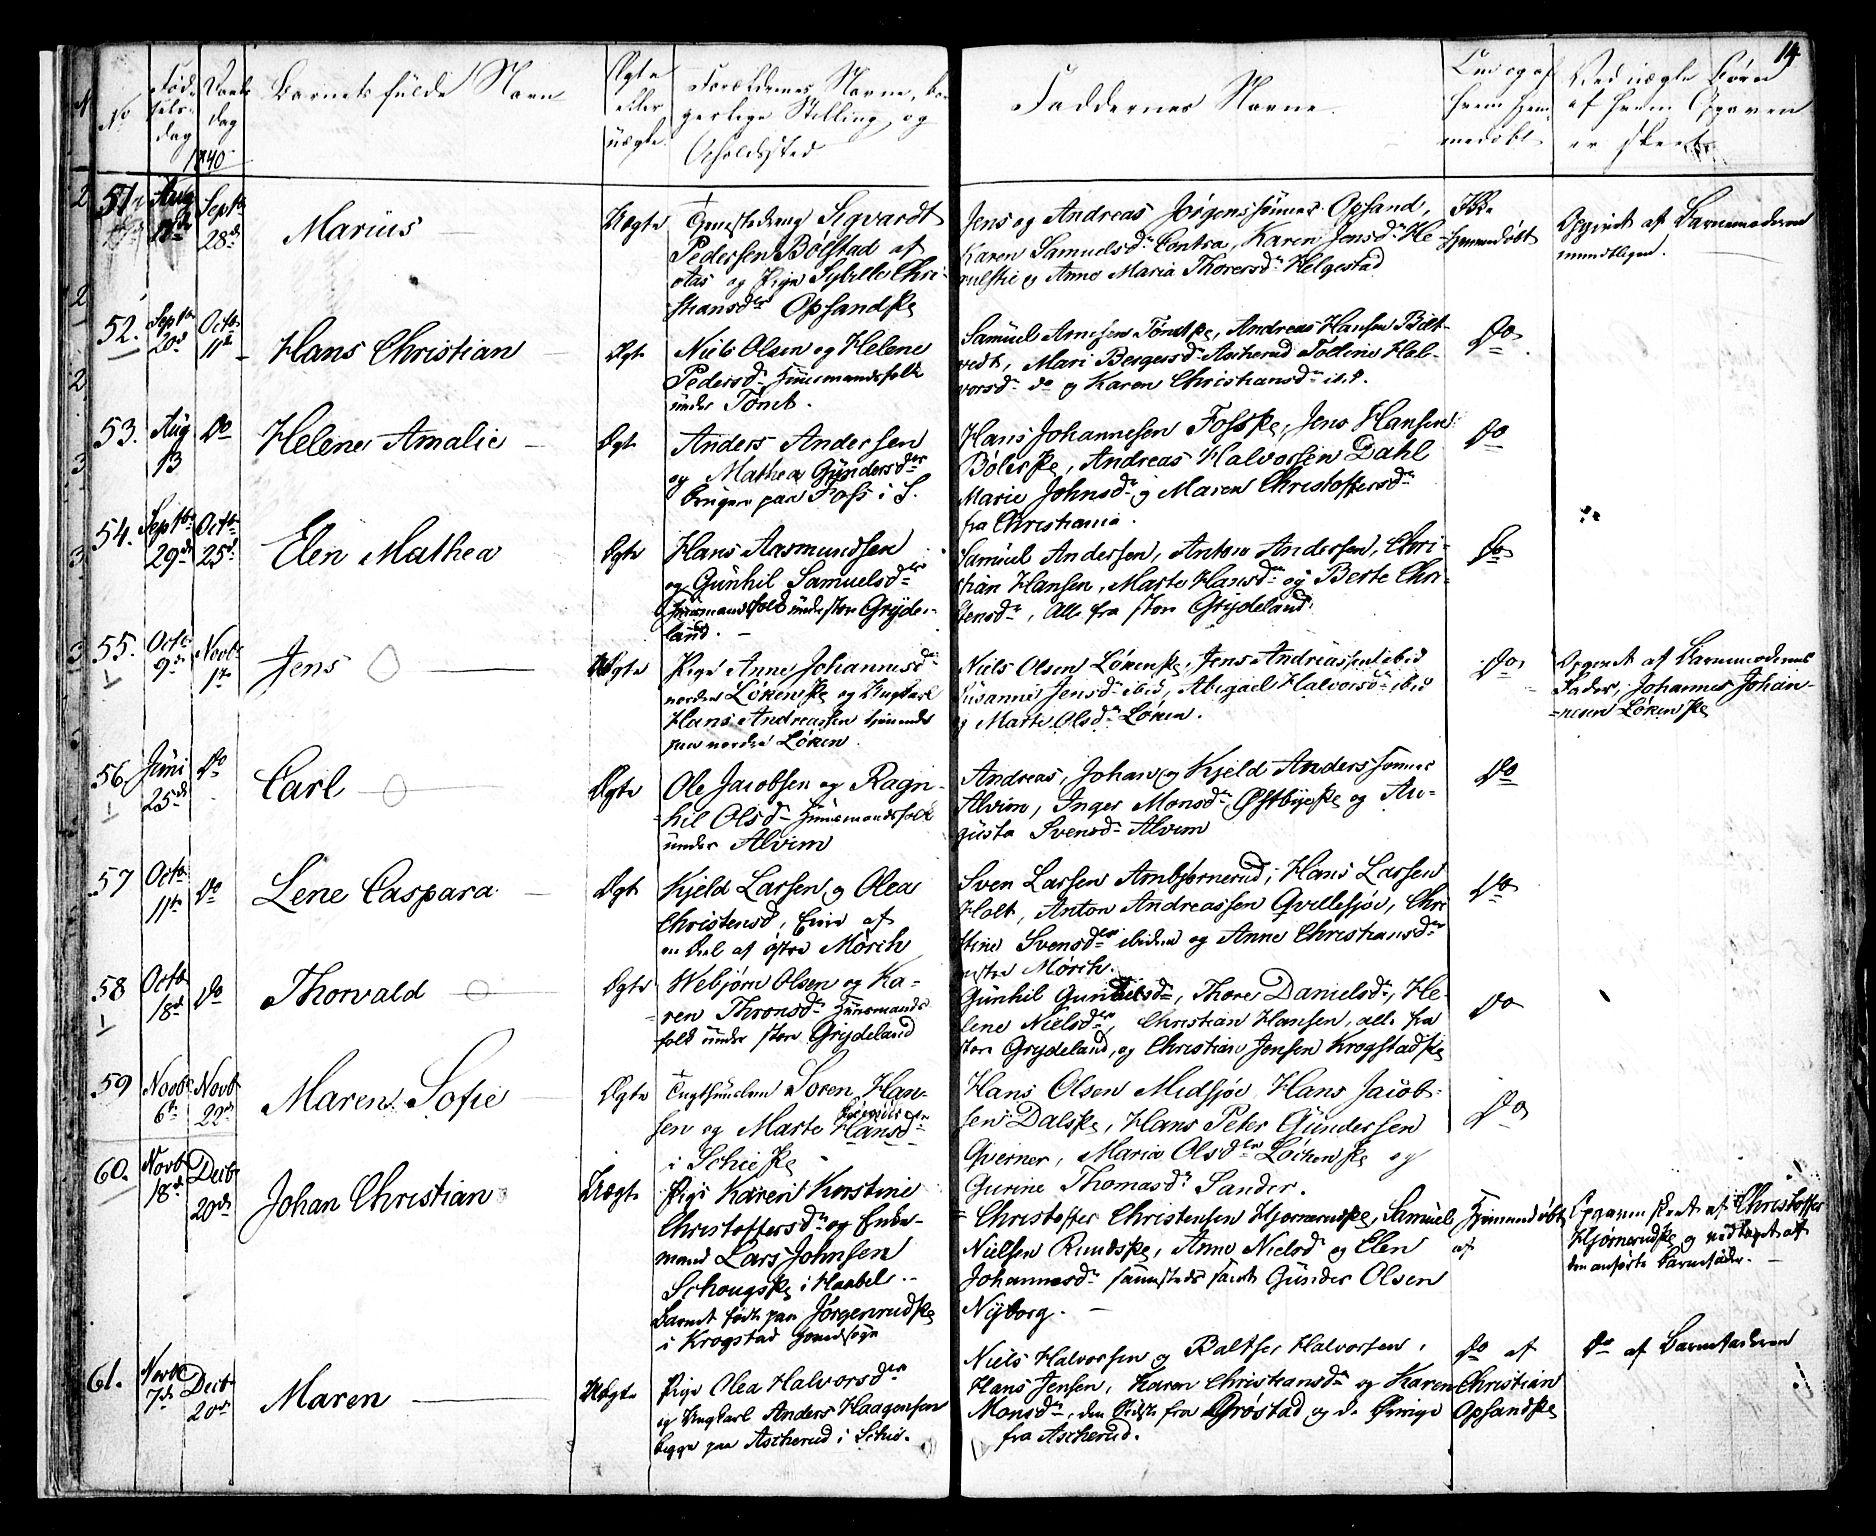 SAO, Kråkstad prestekontor Kirkebøker, F/Fa/L0005: Ministerialbok nr. I 5, 1837-1847, s. 14